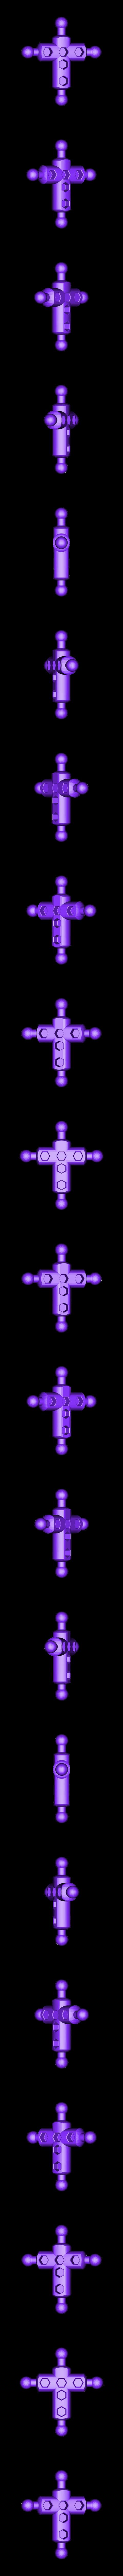 "modibot-remix-torso-upper.stl Download free STL file Modibot action figure ""easy print"" remix • 3D printer design, firebird"